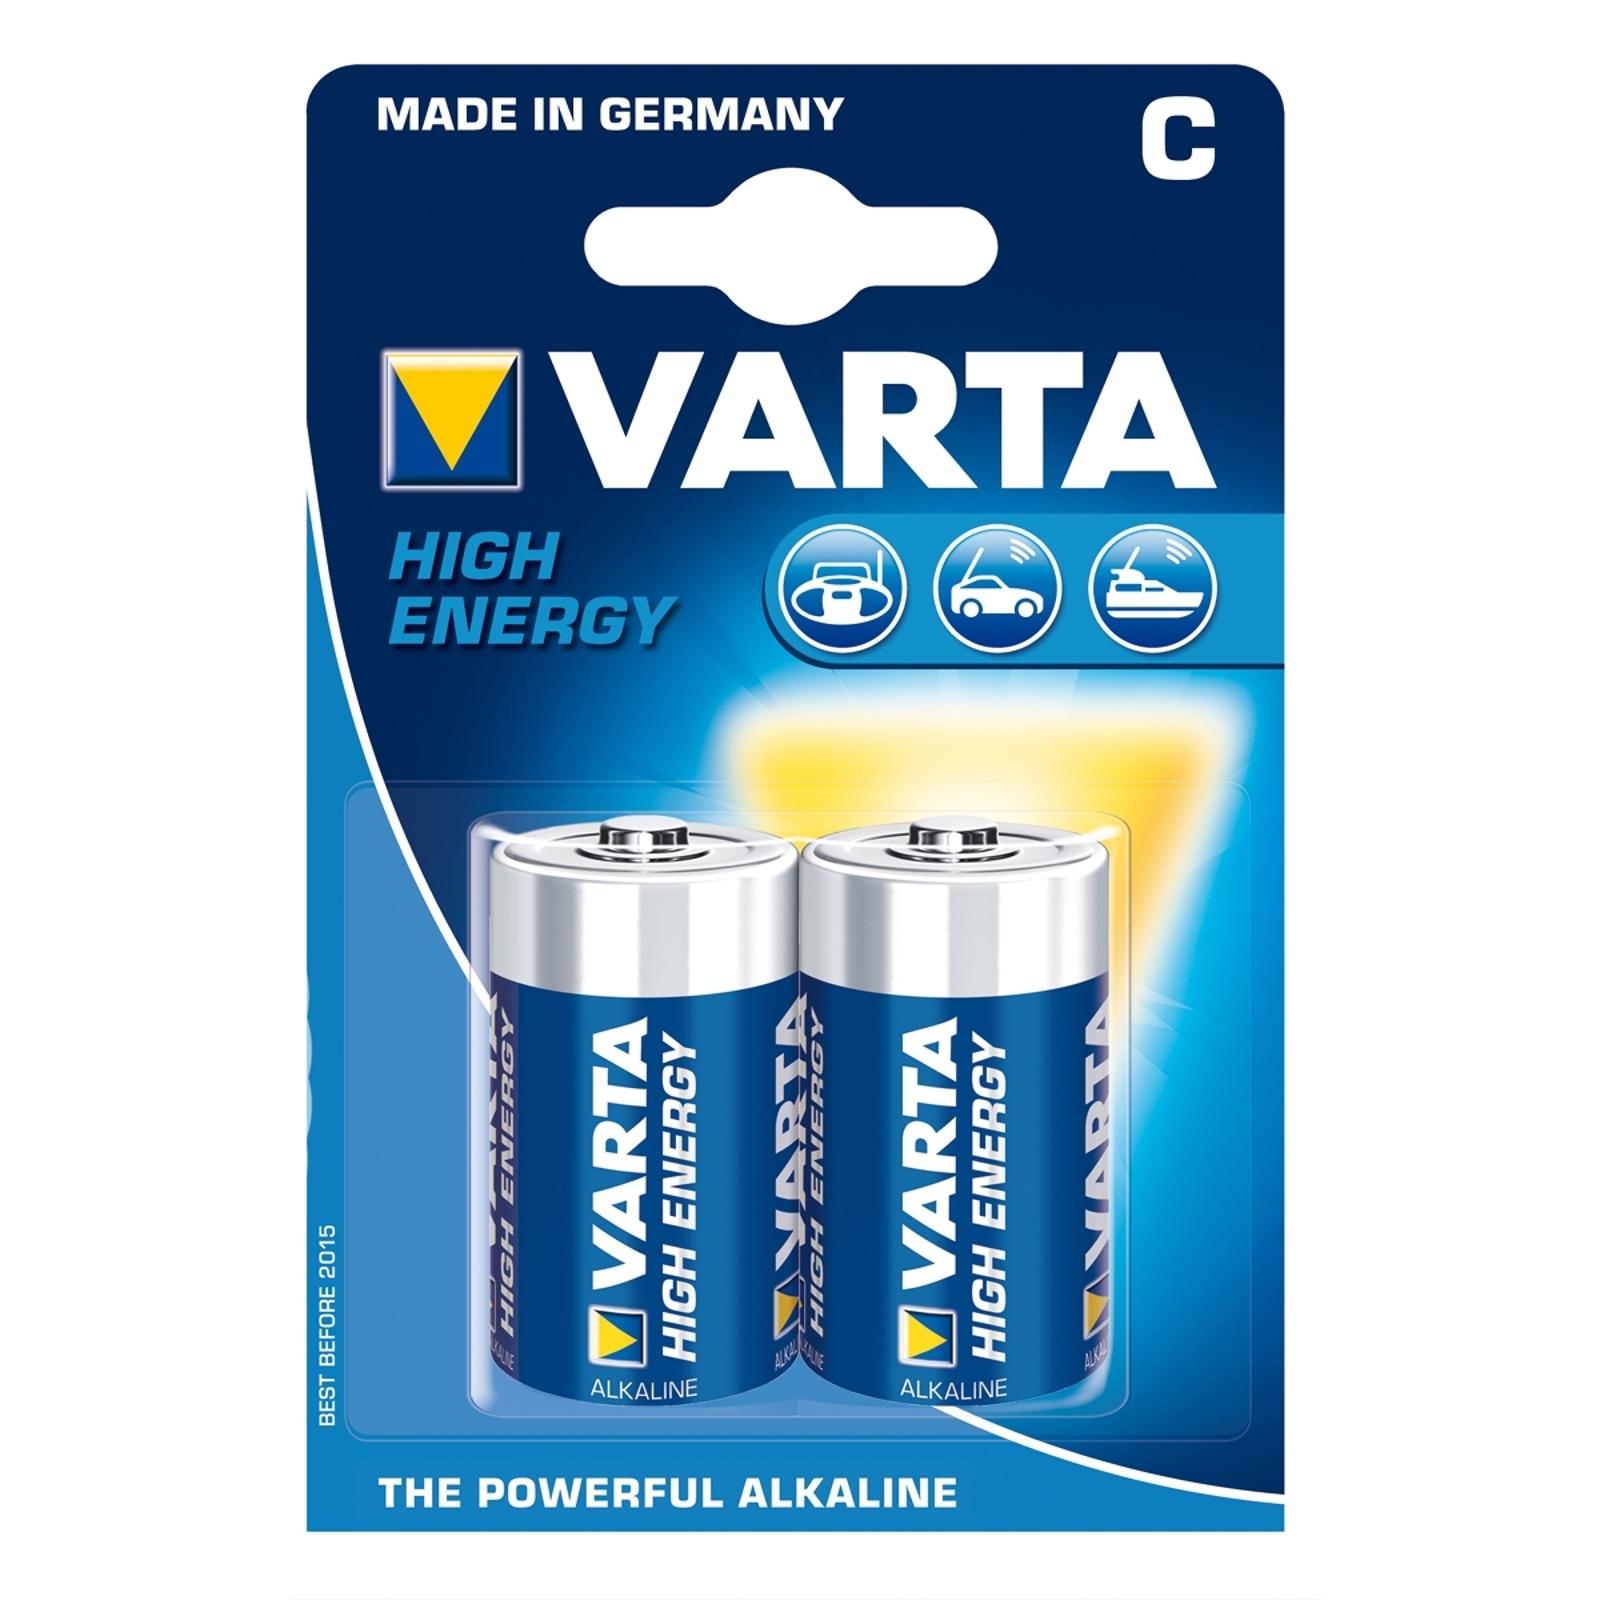 VARTA High Energy baterías Baby 4914 - C